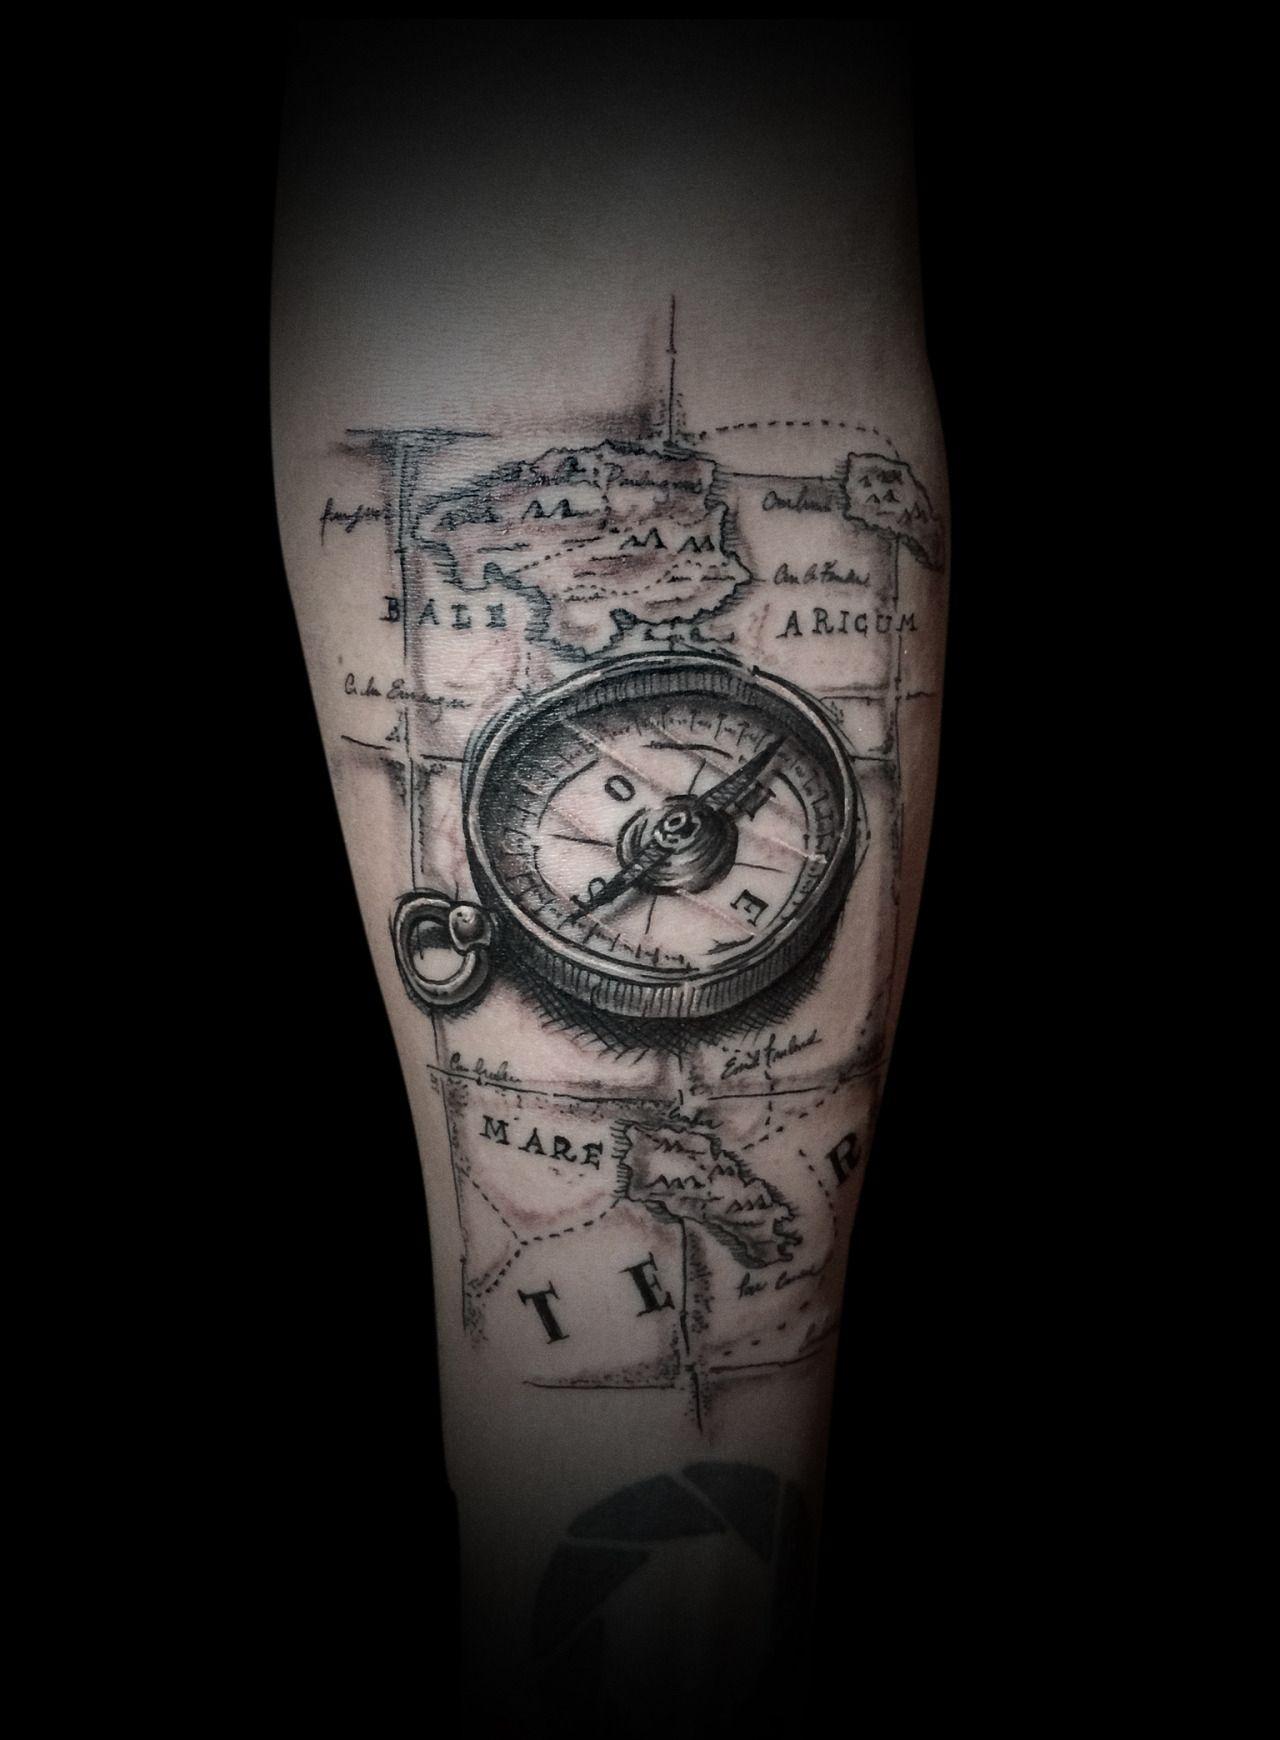 brujula mapa compass map br julas mapas cosas tattoos pinterest tattoo. Black Bedroom Furniture Sets. Home Design Ideas